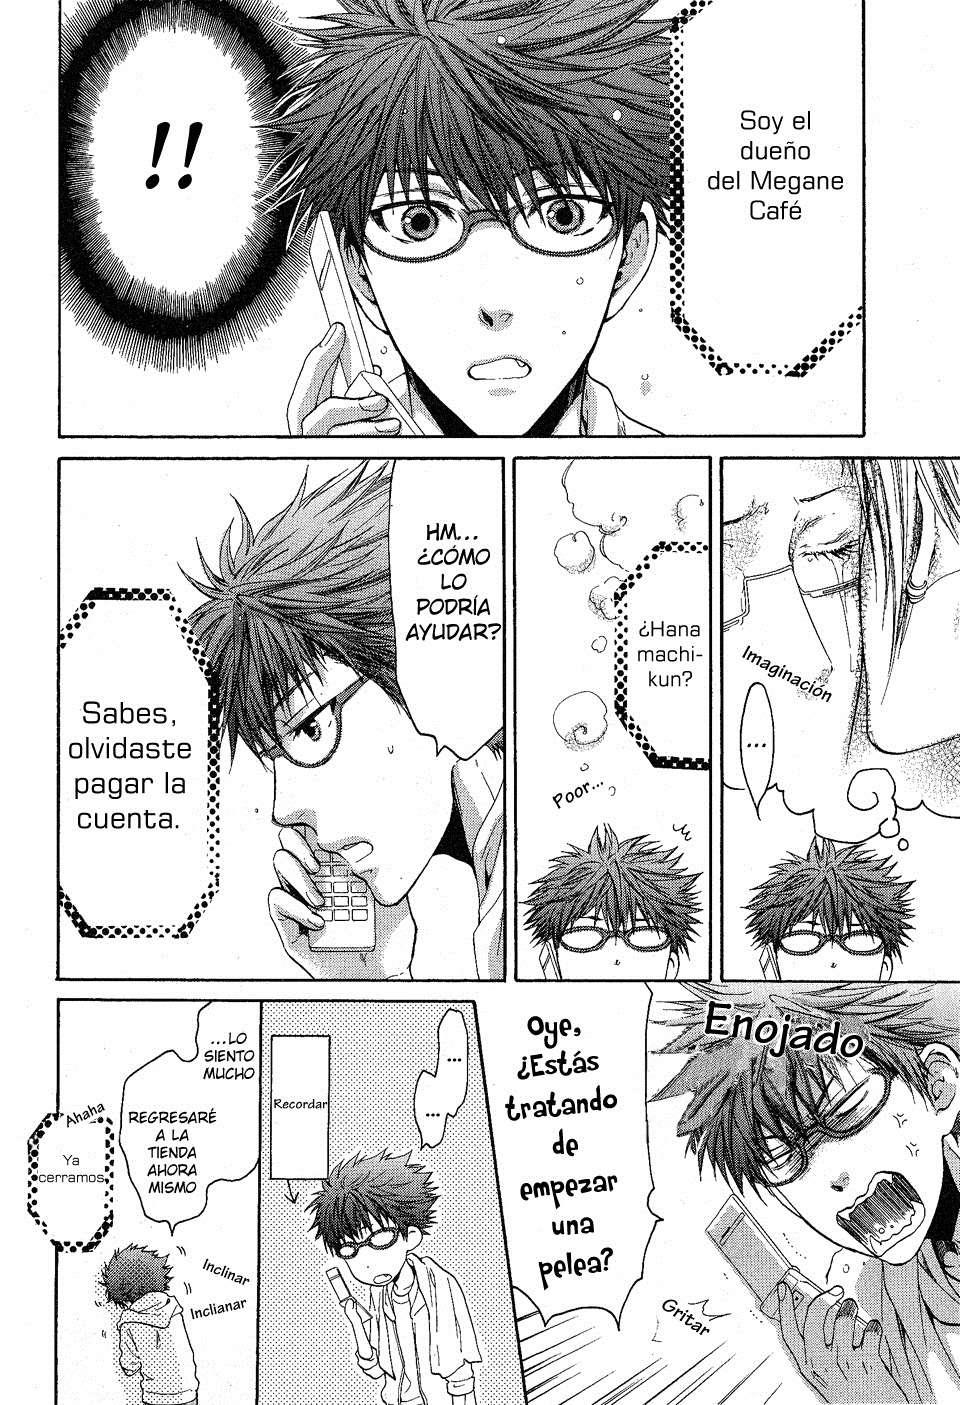 https://c5.ninemanga.com/es_manga/6/15814/378262/c1f20c831ba9760a4b533bbe22baa9c5.jpg Page 27